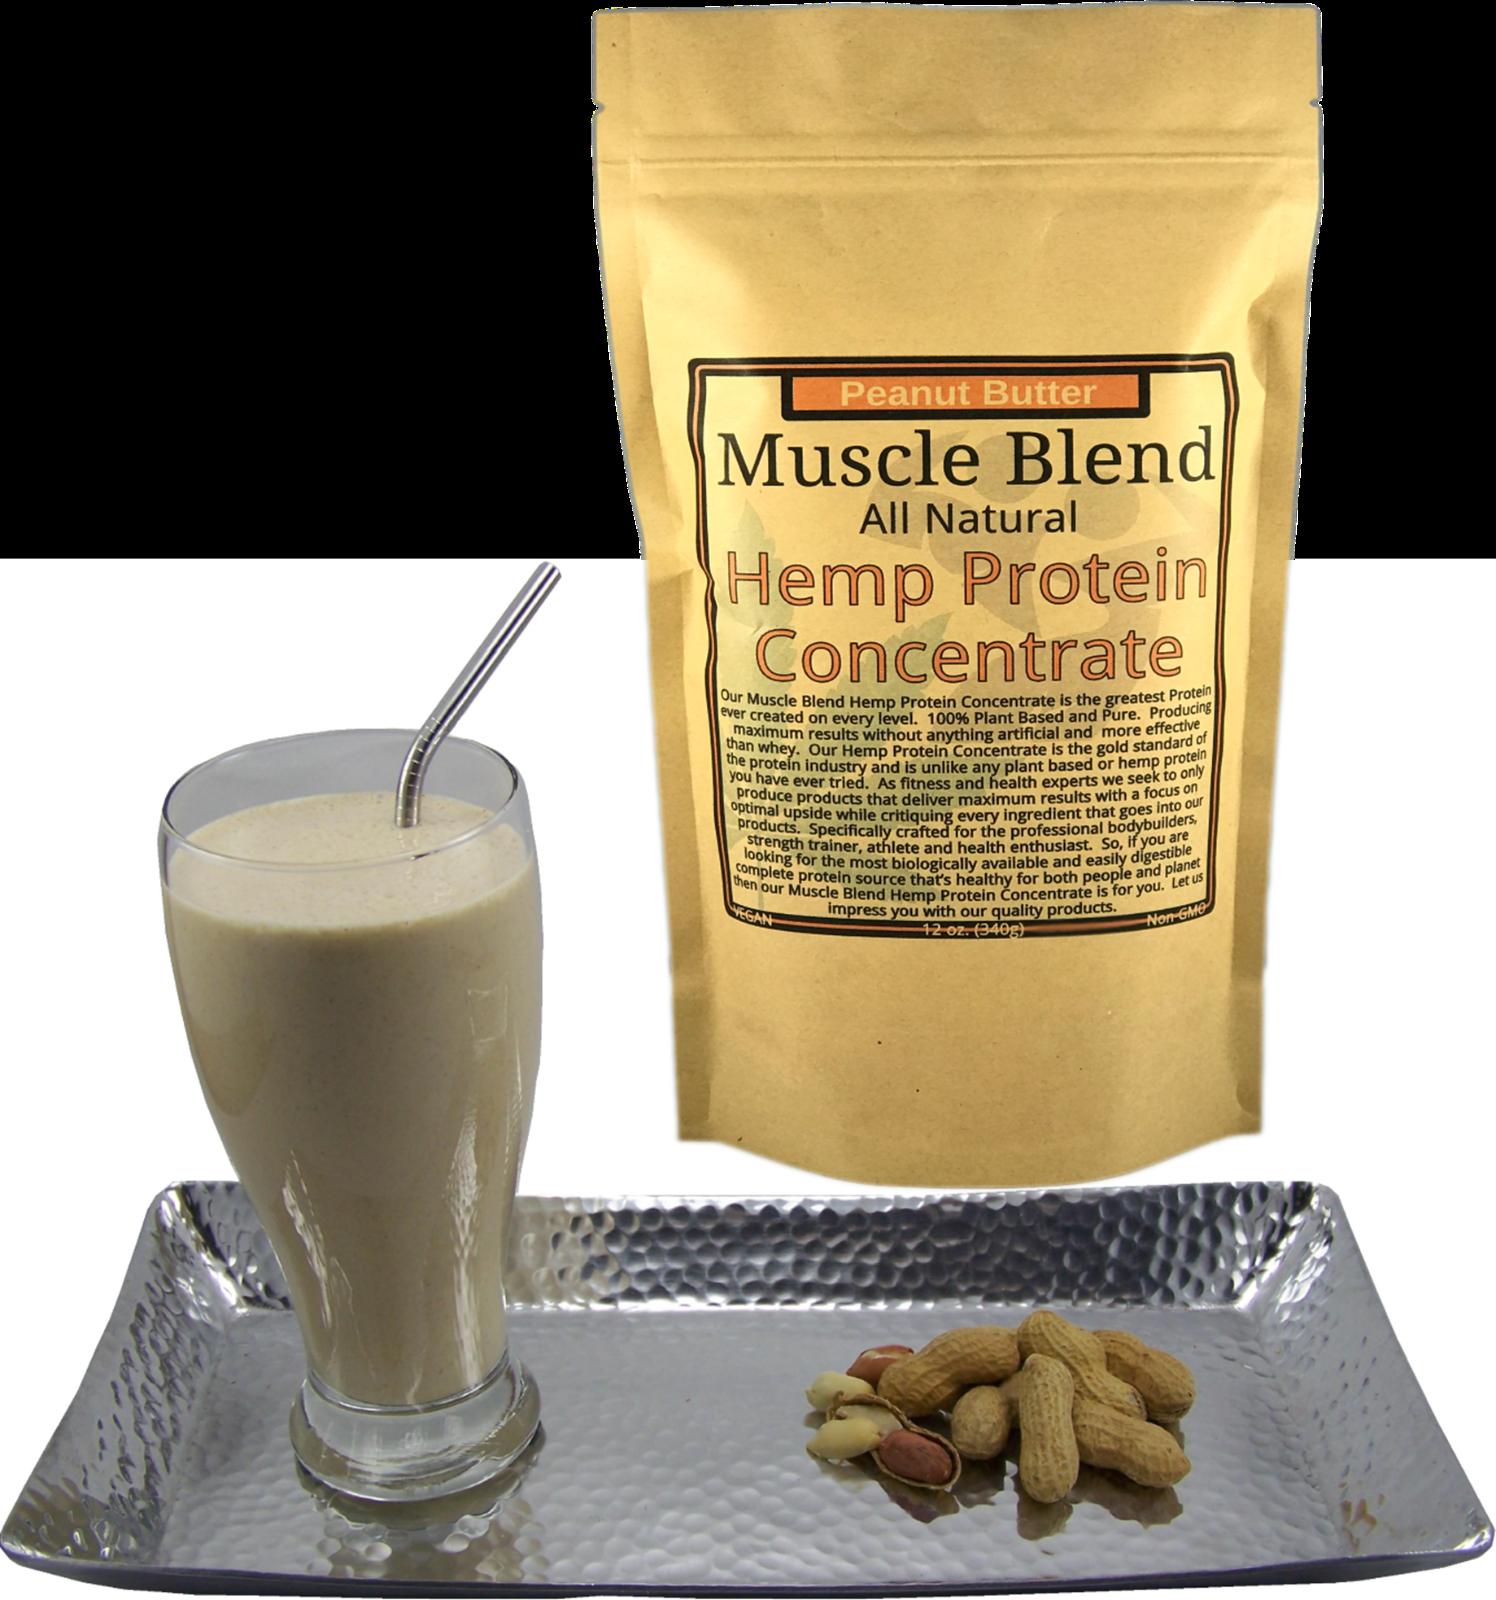 Peanut Butter Hemp Protein Powder Concentrate, Vegan, 100% Pure, Muscle Blend